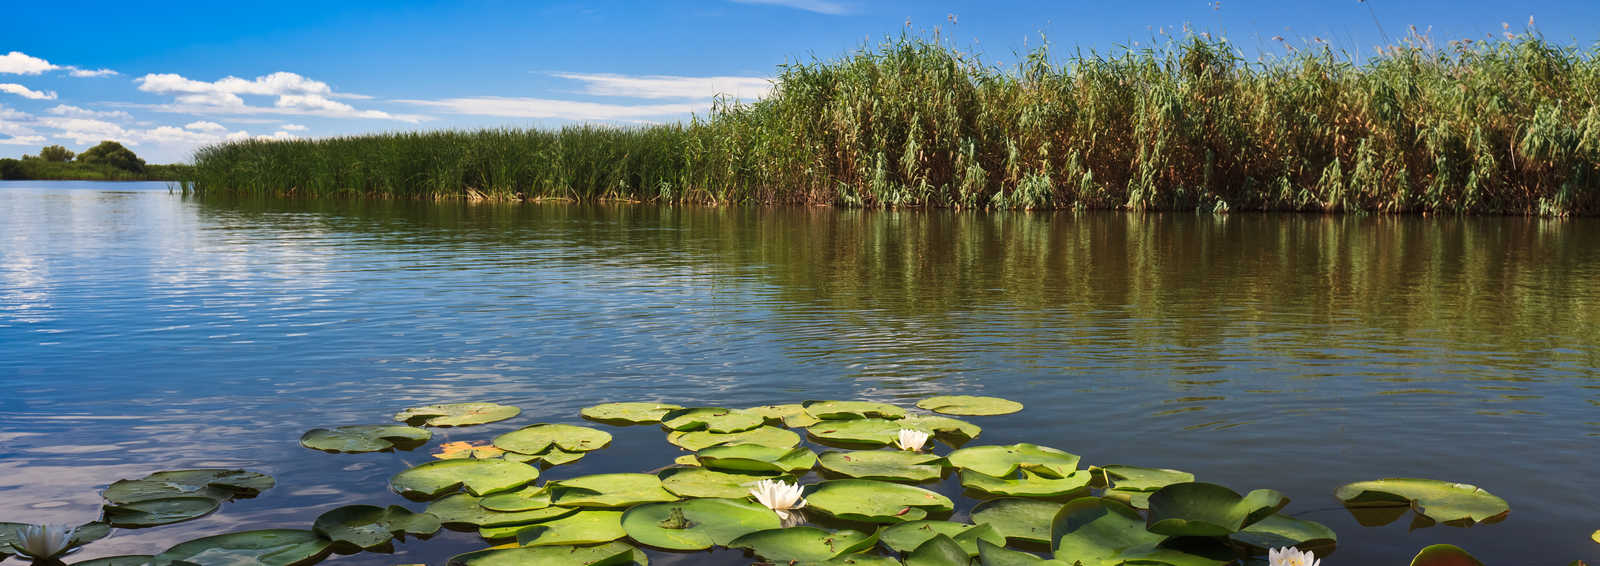 Lake on the danube Delta, Hungary